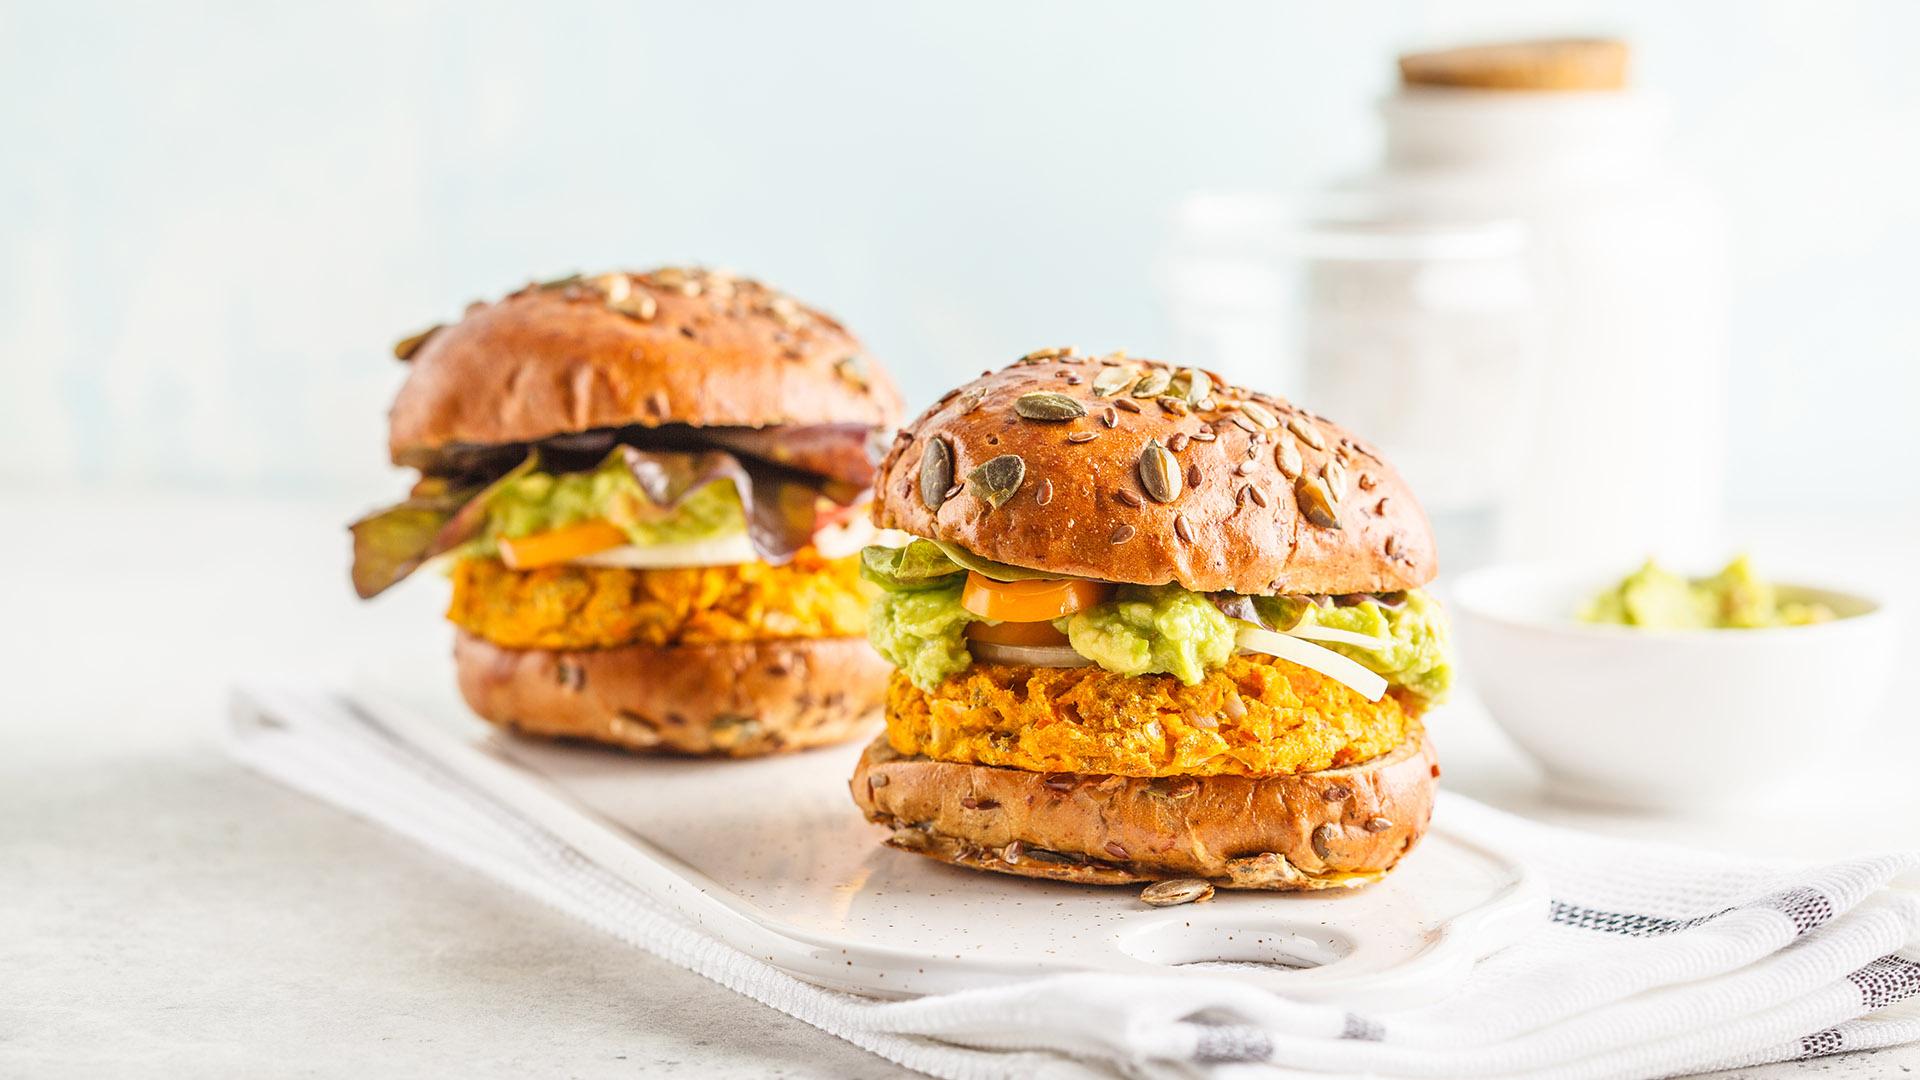 14 Vegetarian Burger Recipes That Everyone Will Love